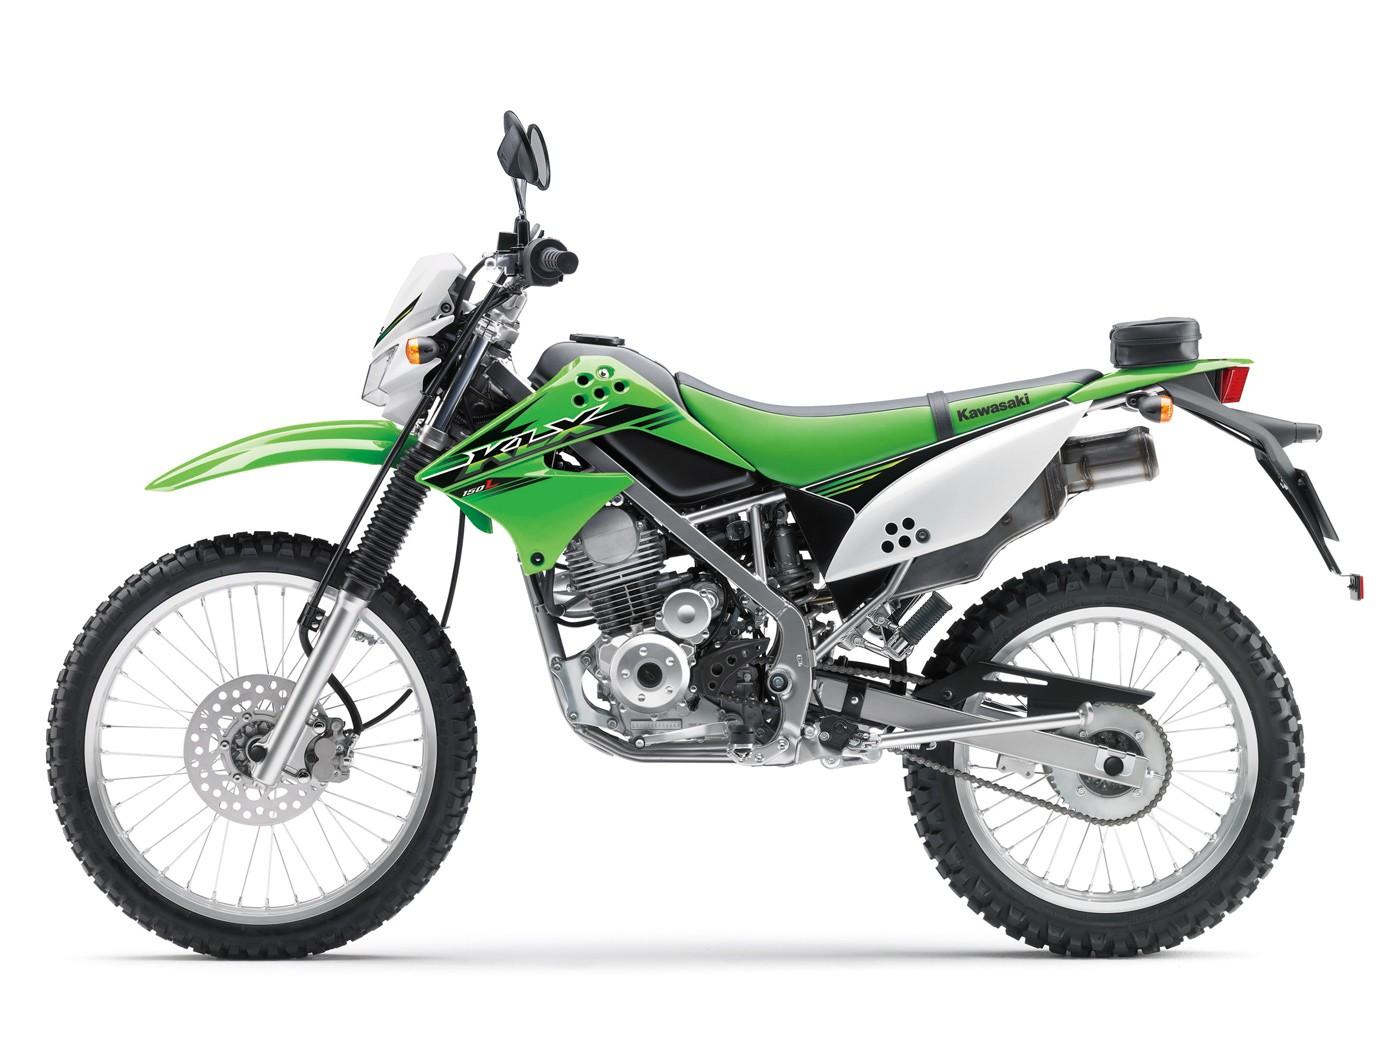 Kawasaki KLX150 aktor tunggal di segmen enduro aka. kelas garuk tanah